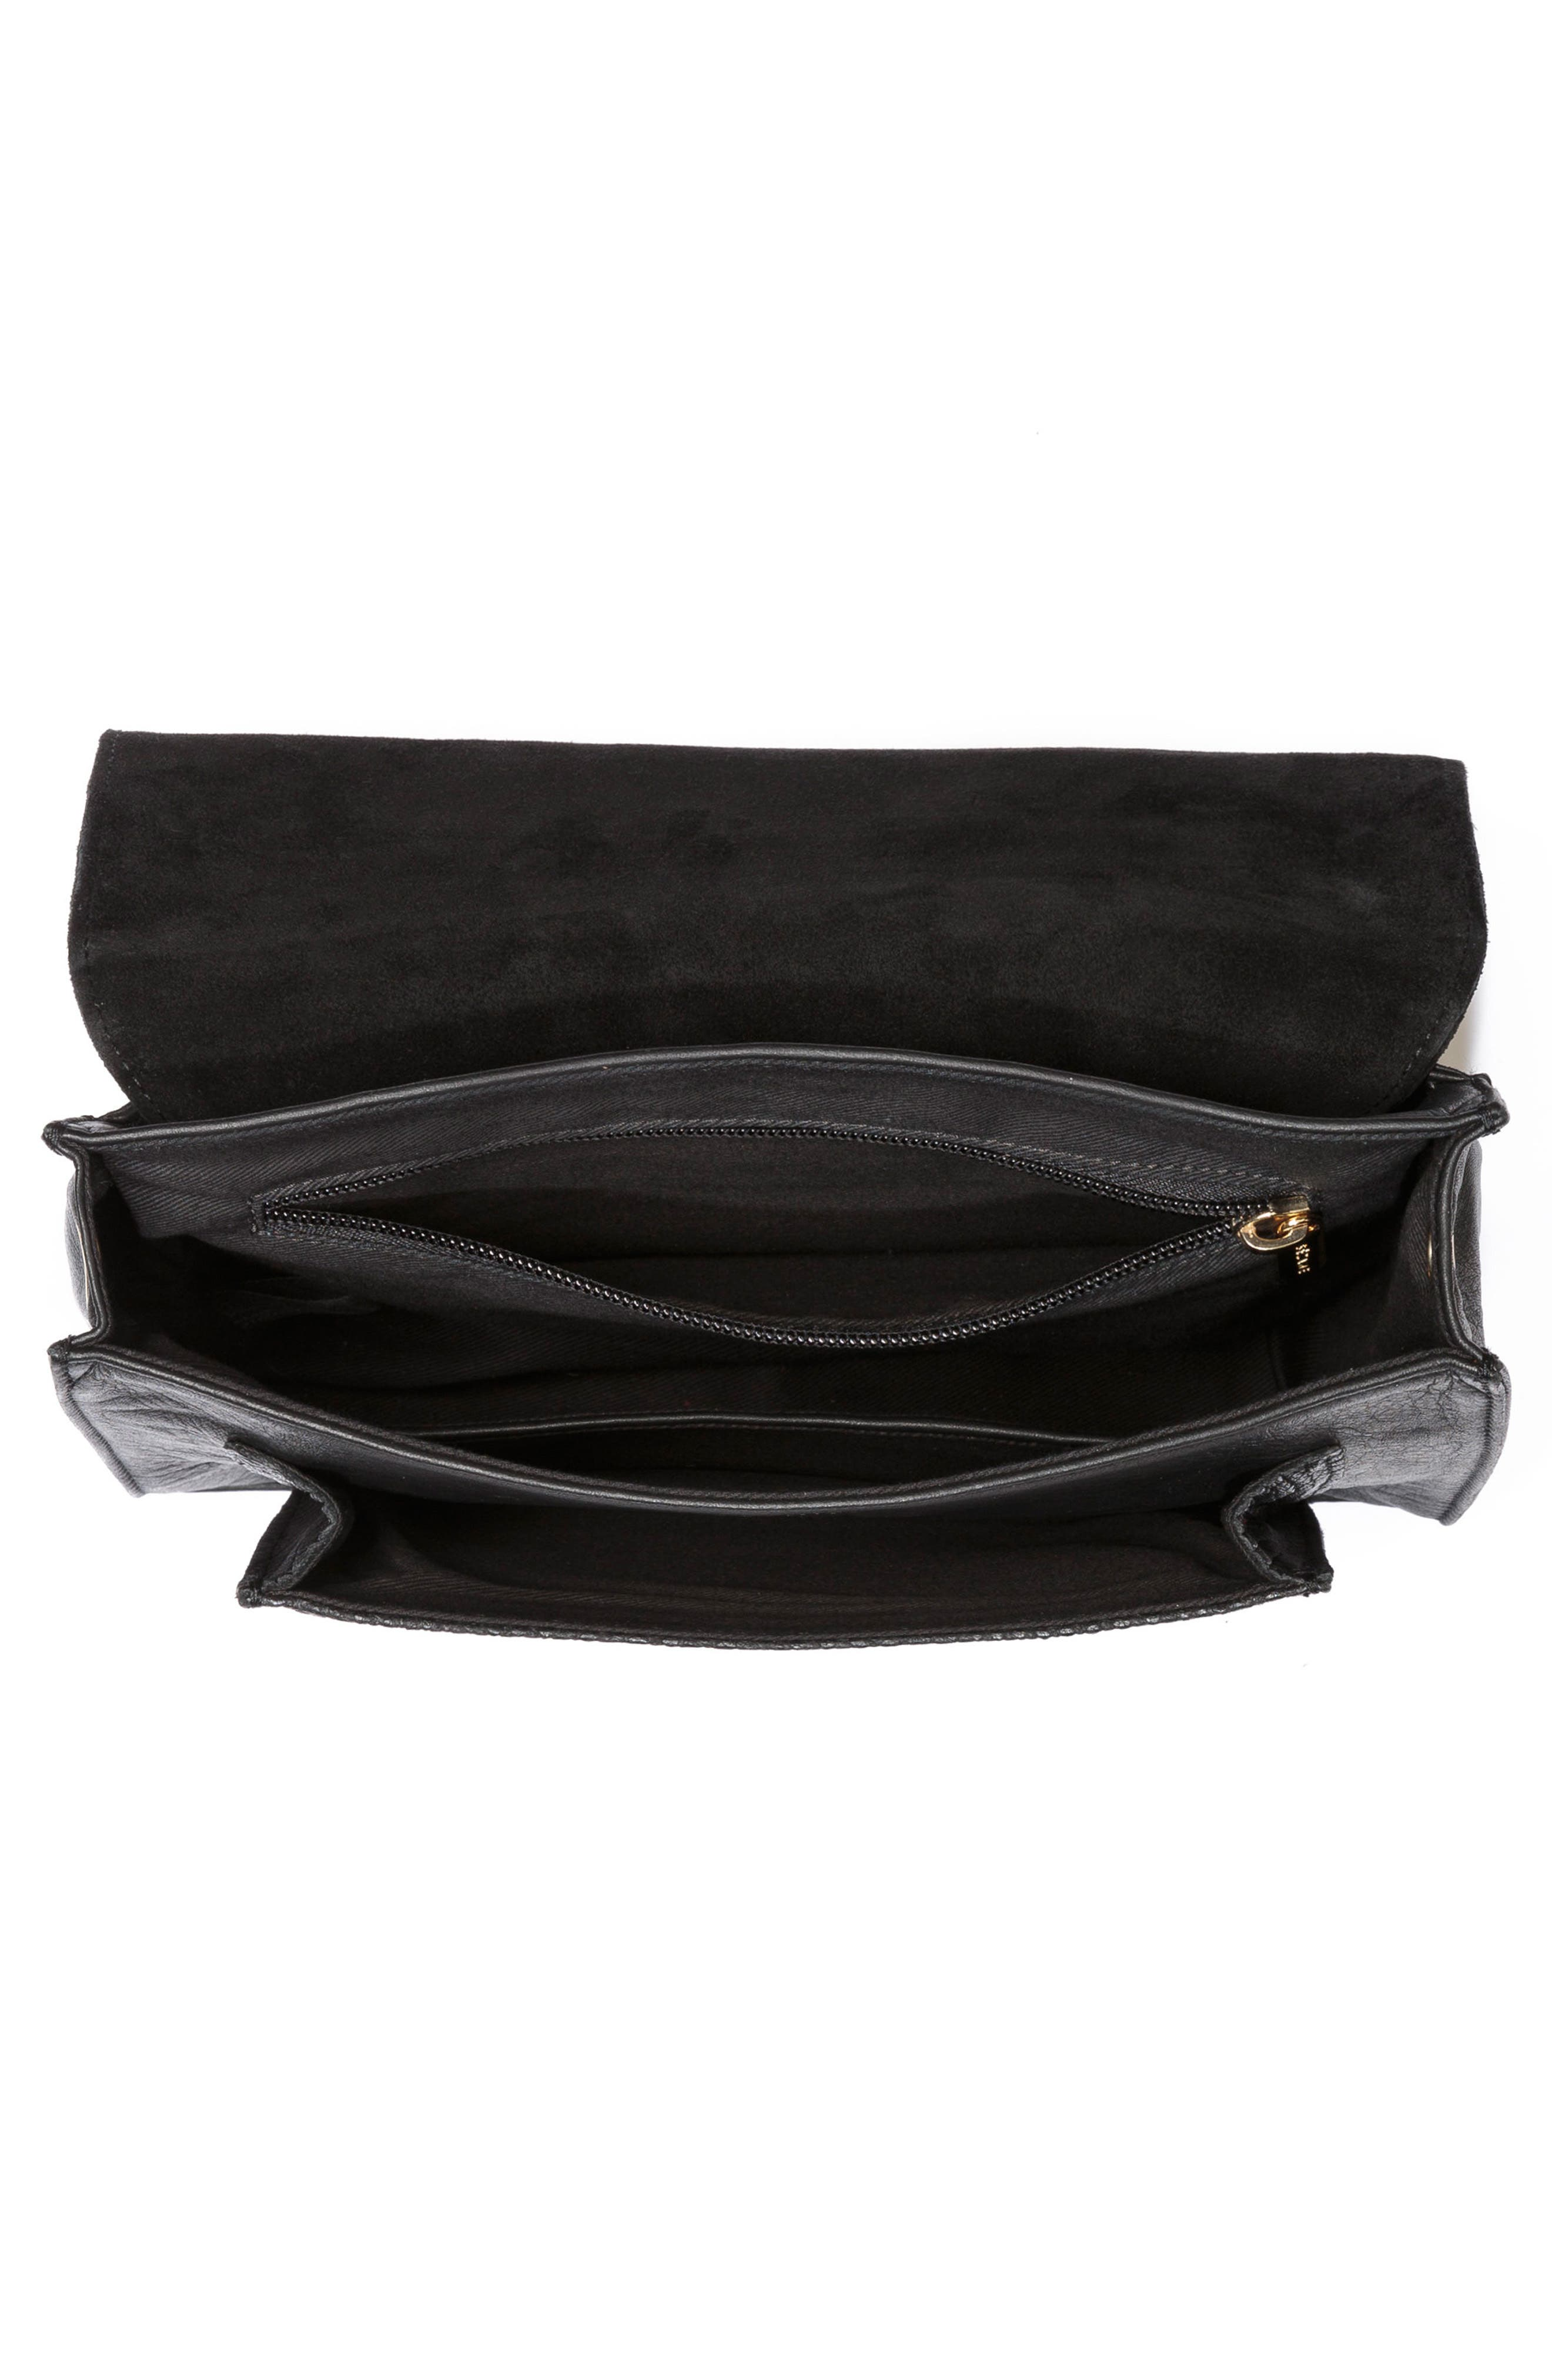 Tiger Crossbody Bag,                             Alternate thumbnail 4, color,                             Black